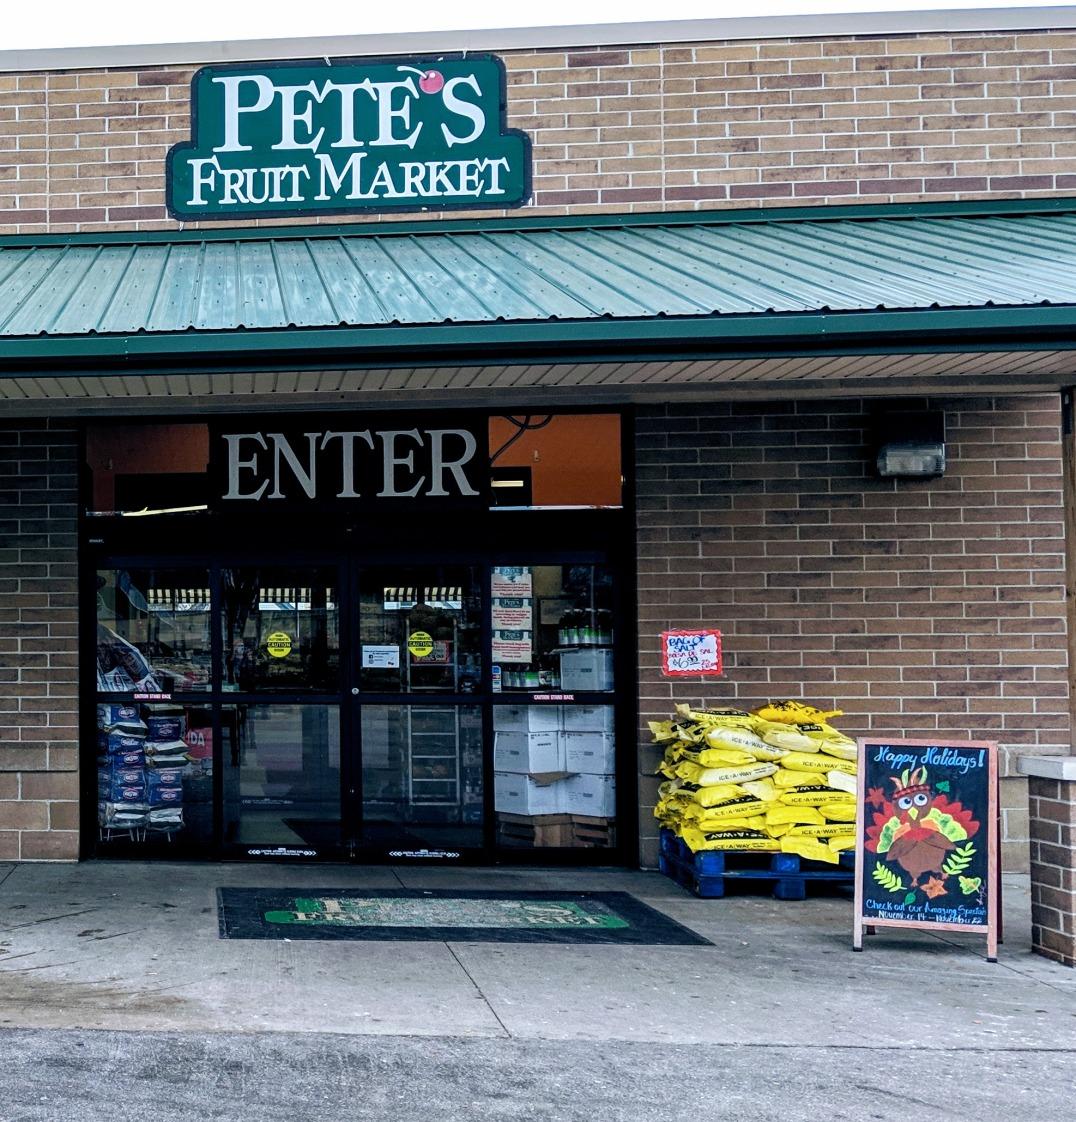 petes fruit market entry